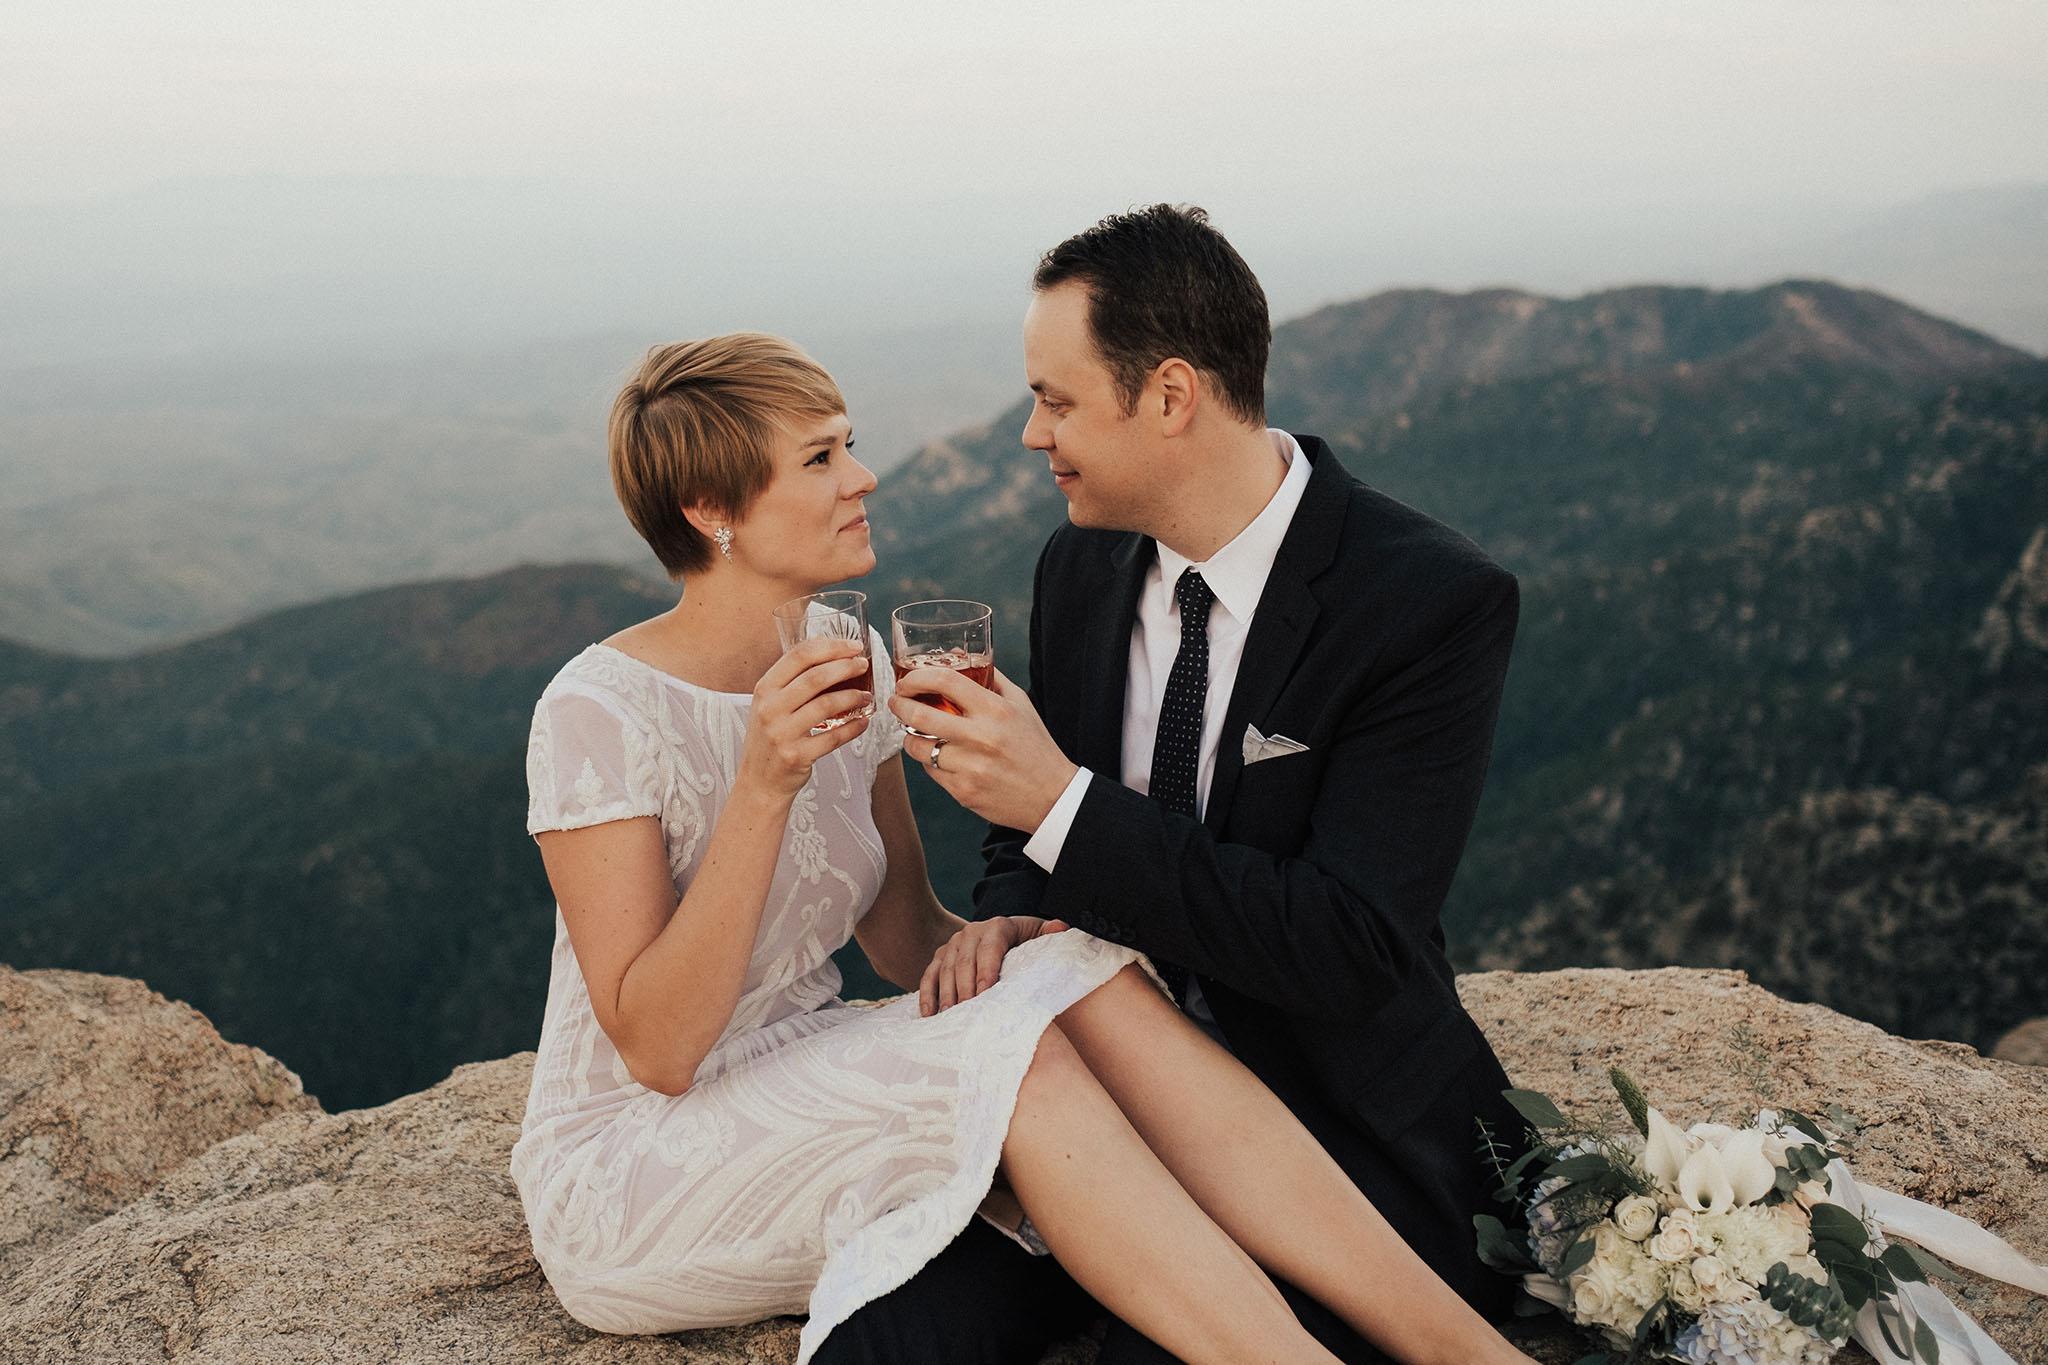 Arizona-Intimate-Elopement-Adventure-Photographer-Mount-Lemmon (26).jpg